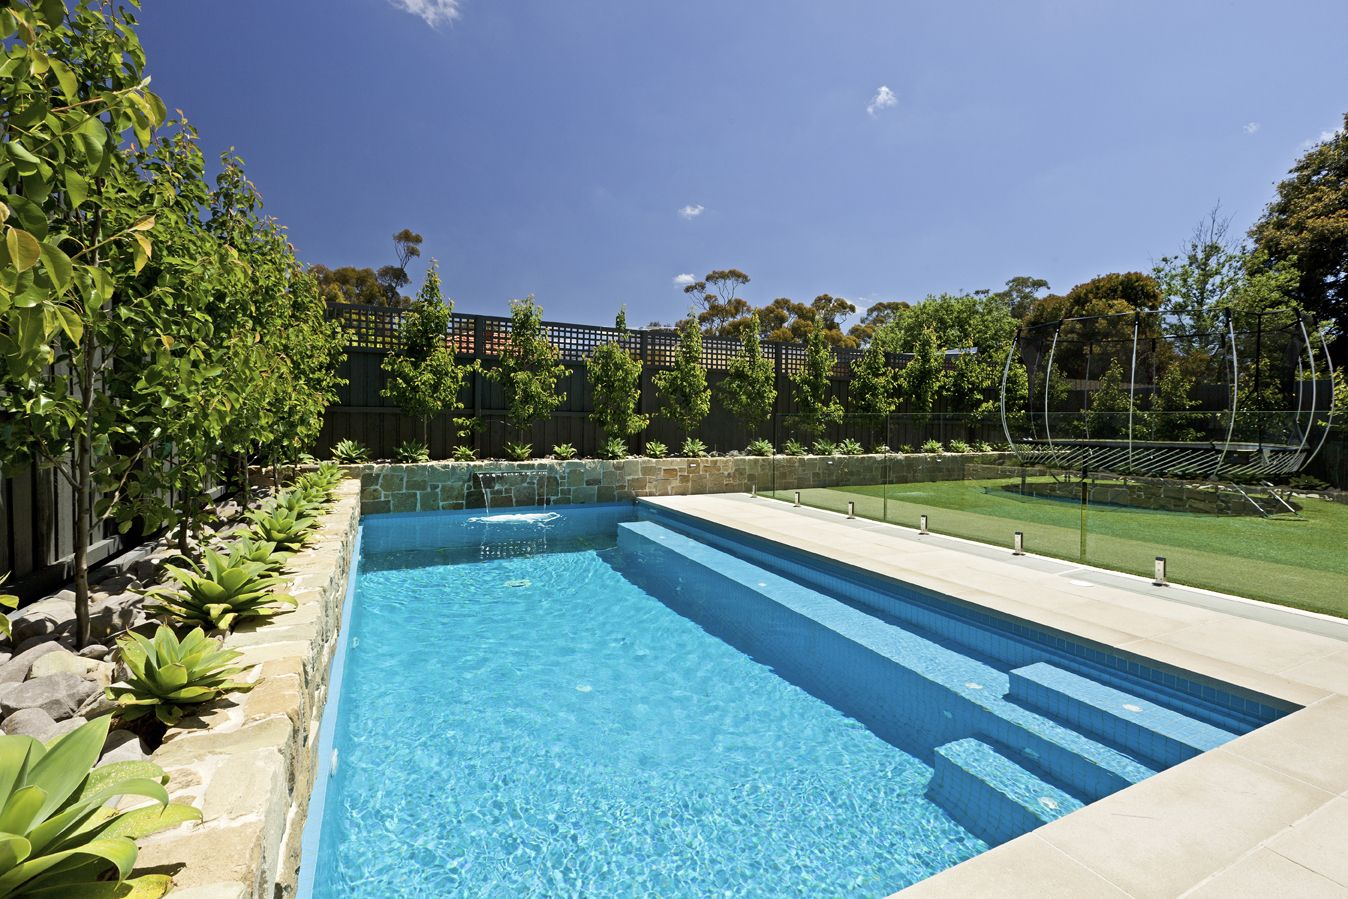 Minimalist Swimming Pool for Simple Look